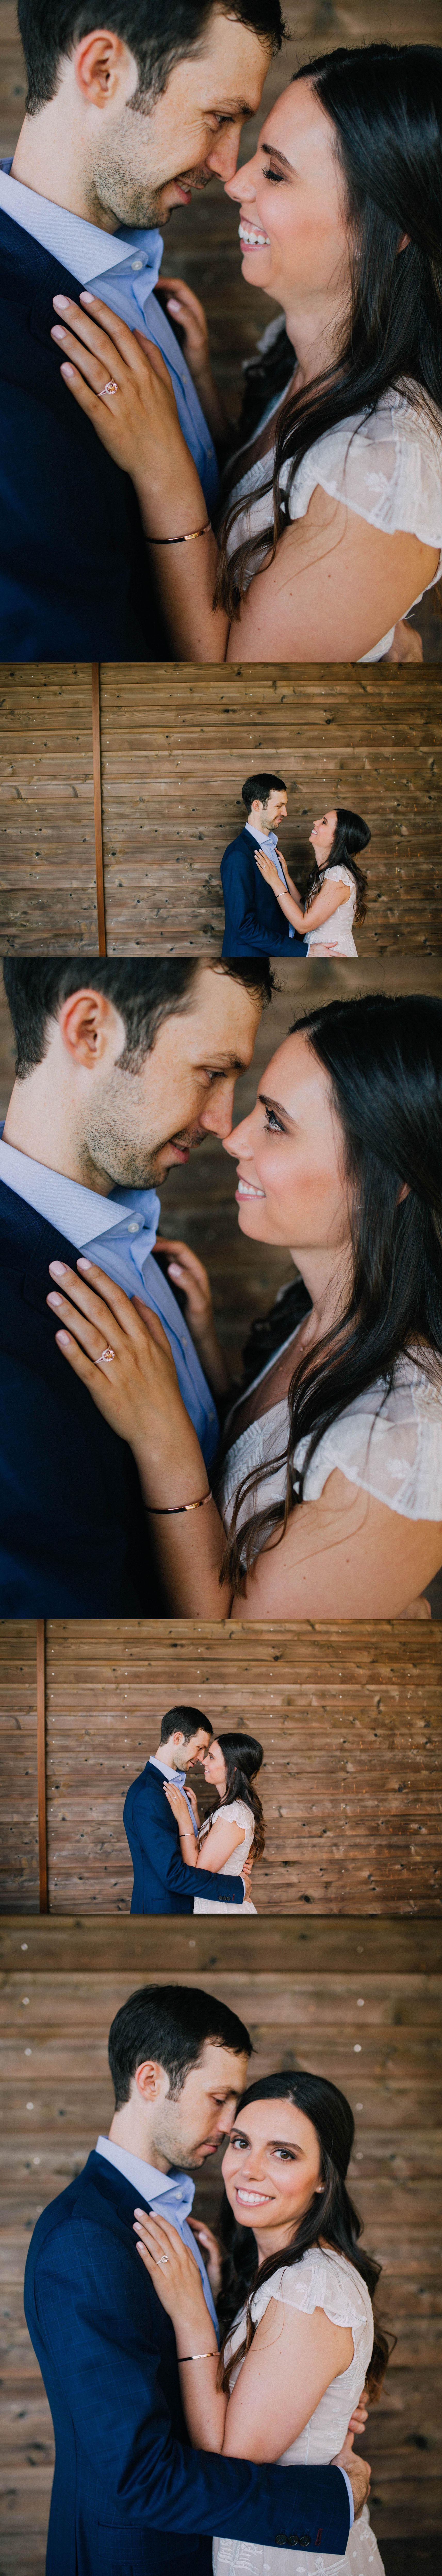 Seattle courthouse and wedding photographer ballard wedding ashley vos-12.jpg